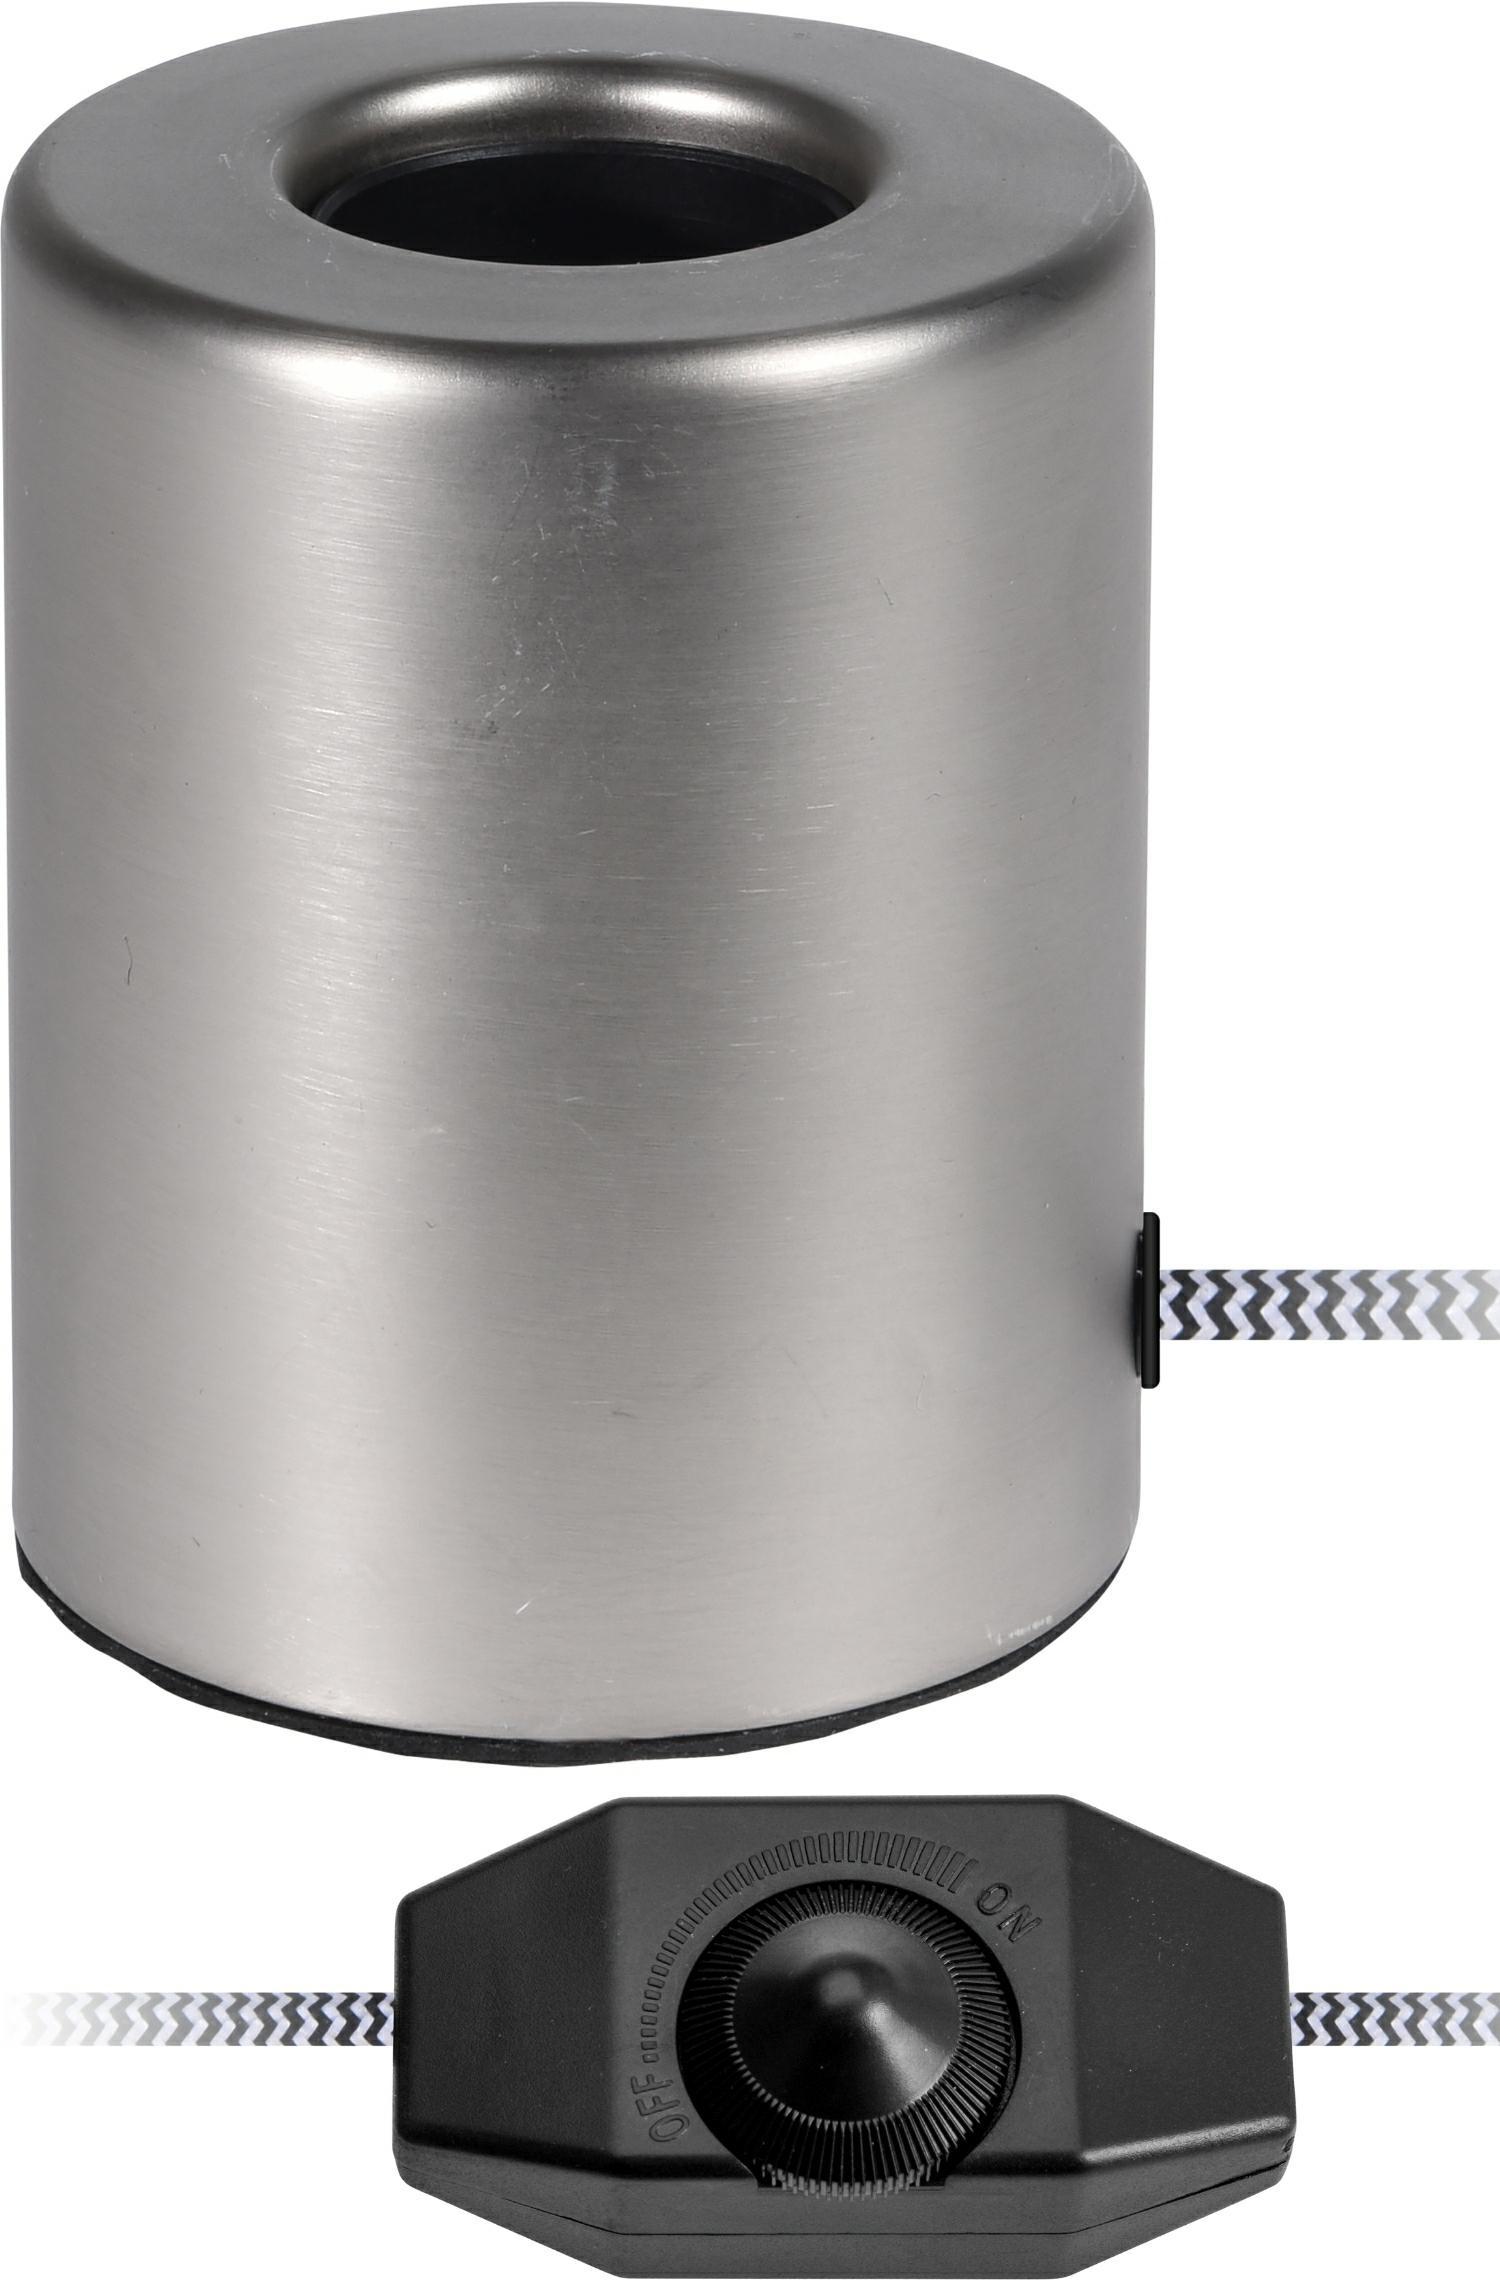 Lampa stolní Intesi Bulb